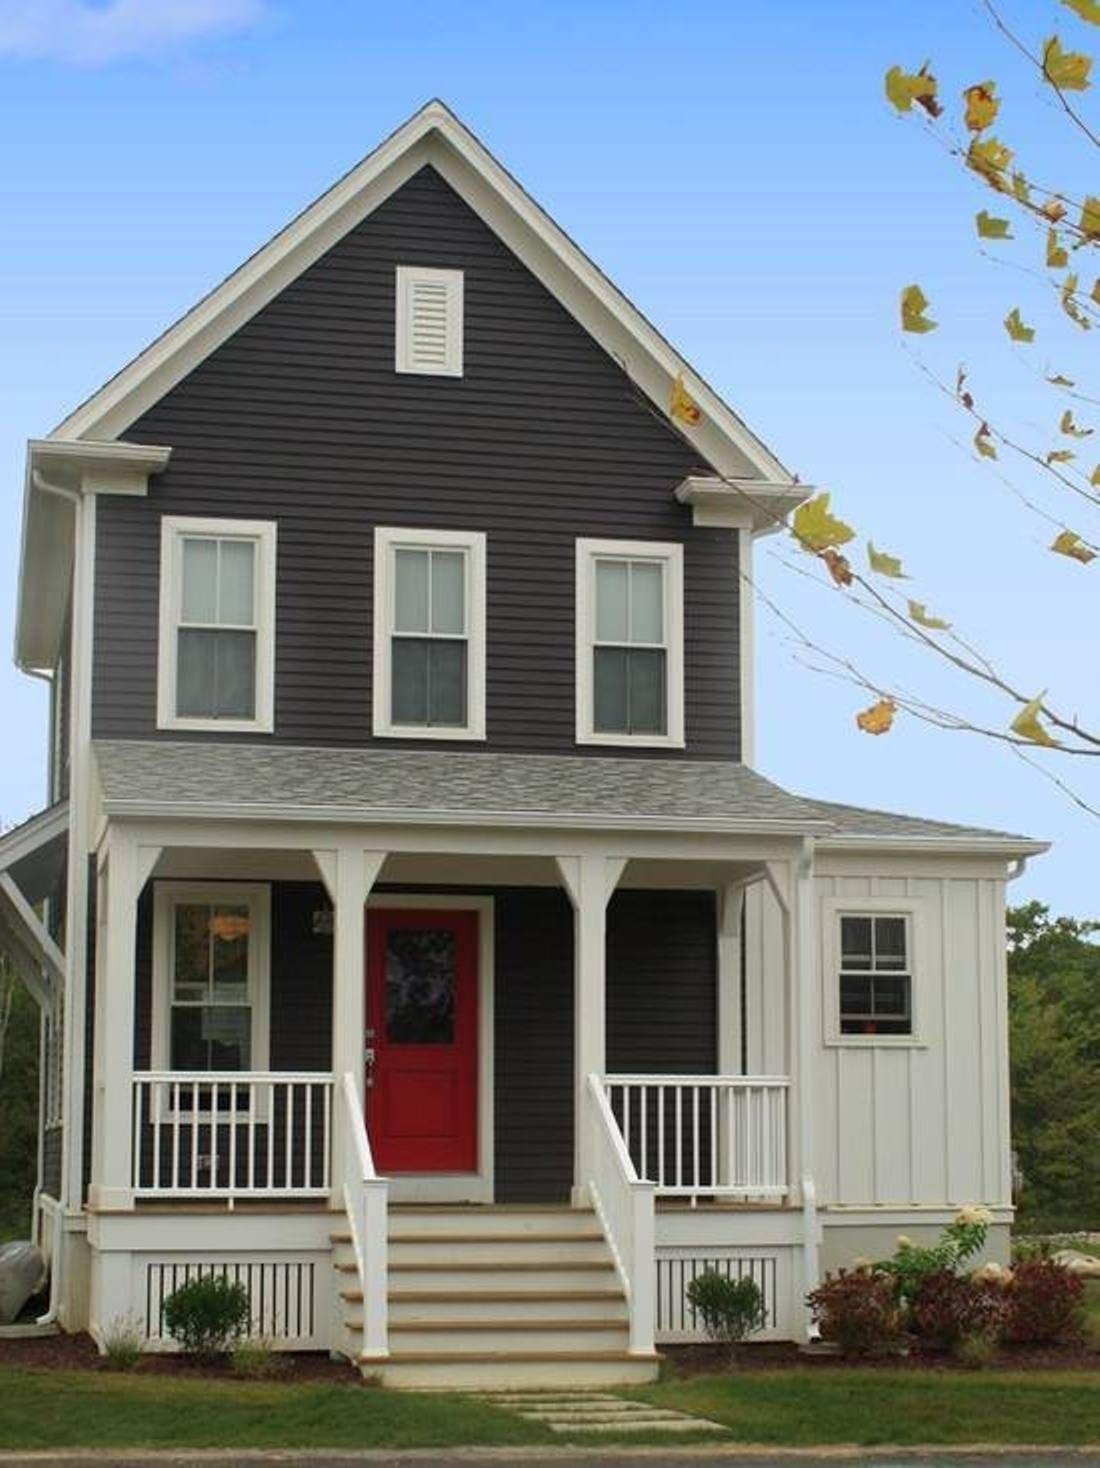 10 Fantastic Exterior Paint Ideas For Homes exterior of homes designs house paint color combination exterior 2021